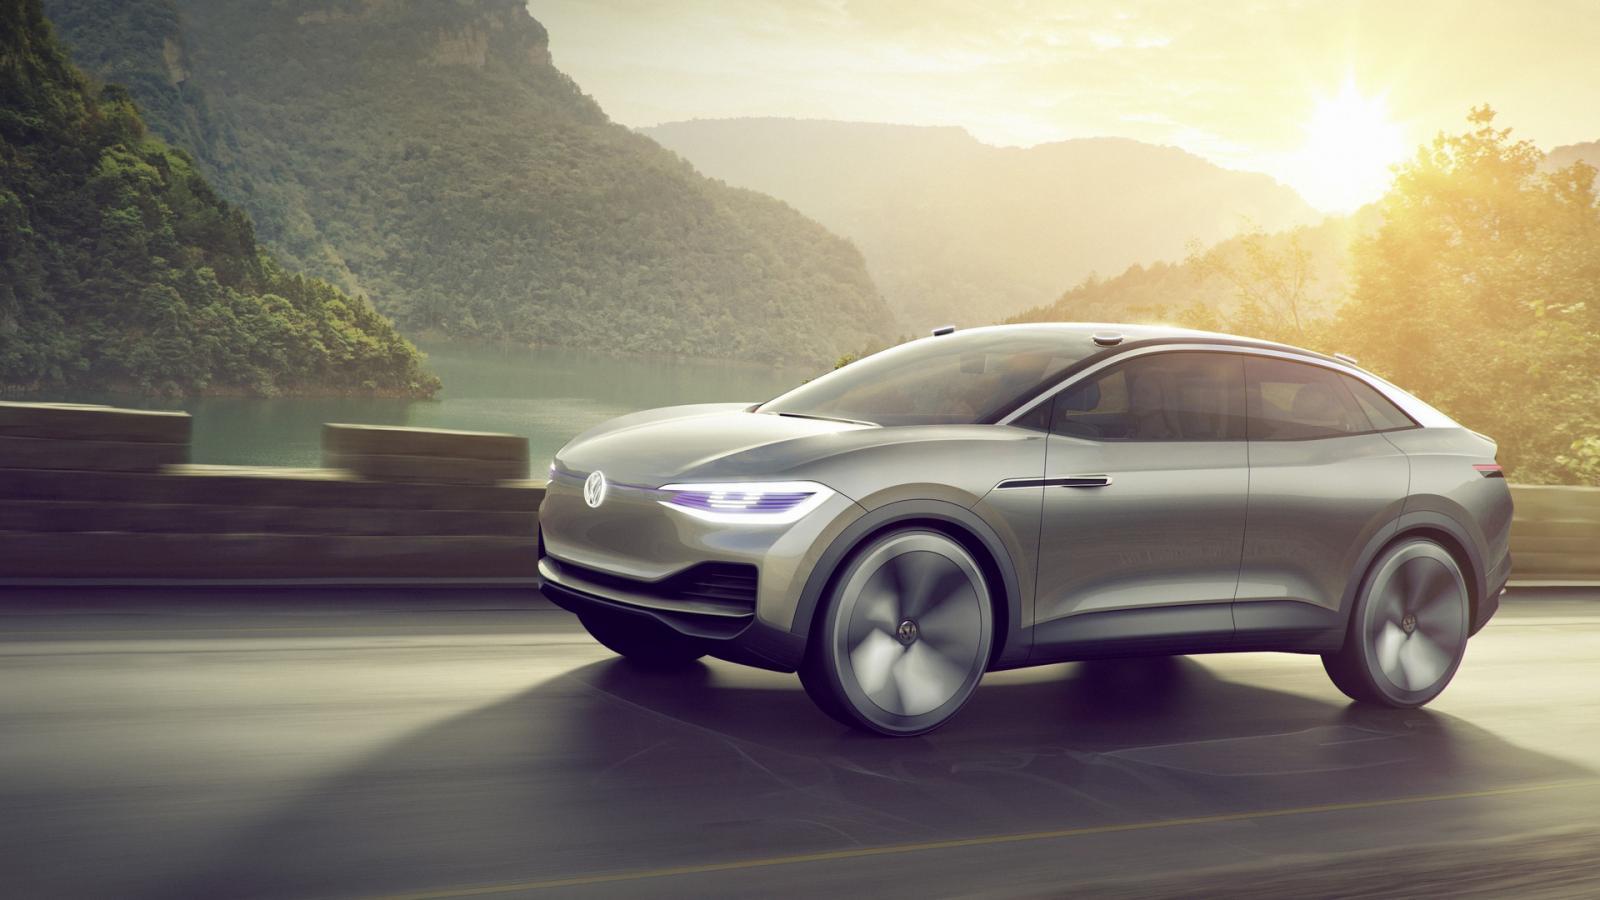 VW представил концептуальный кроссовер I. D. Crozz